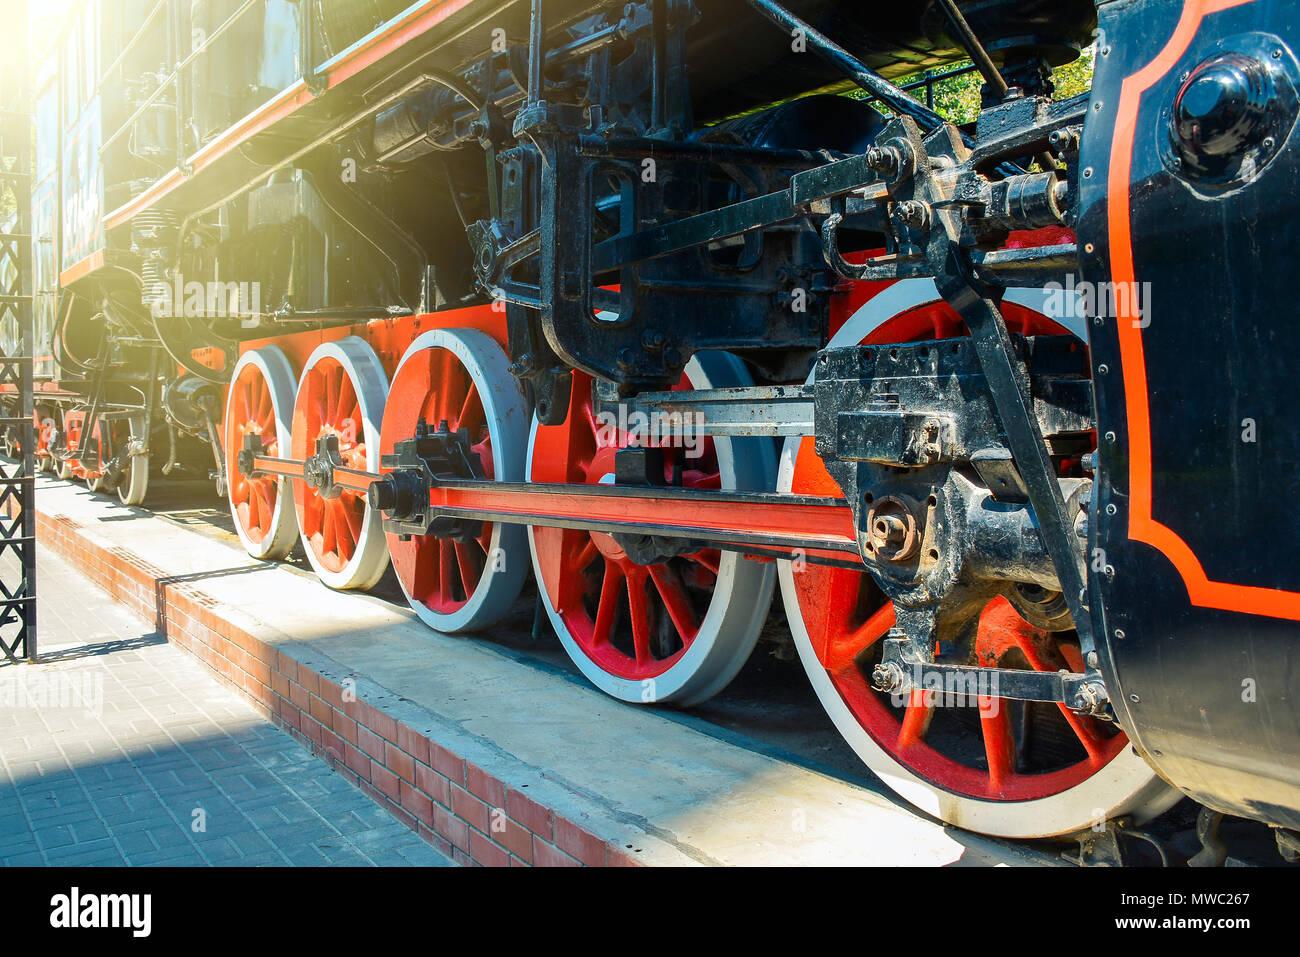 Old Soviet steam locomotive of the Second World War Stock Photo